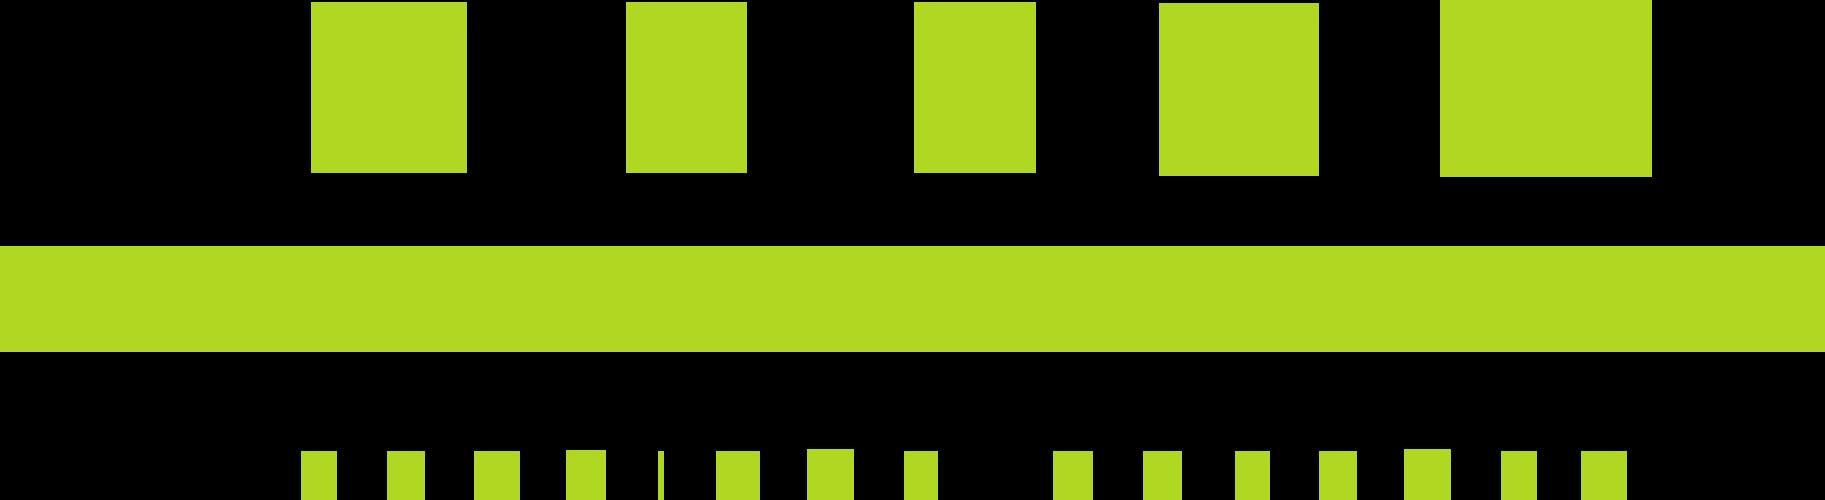 Arrow_Logo_lime.png